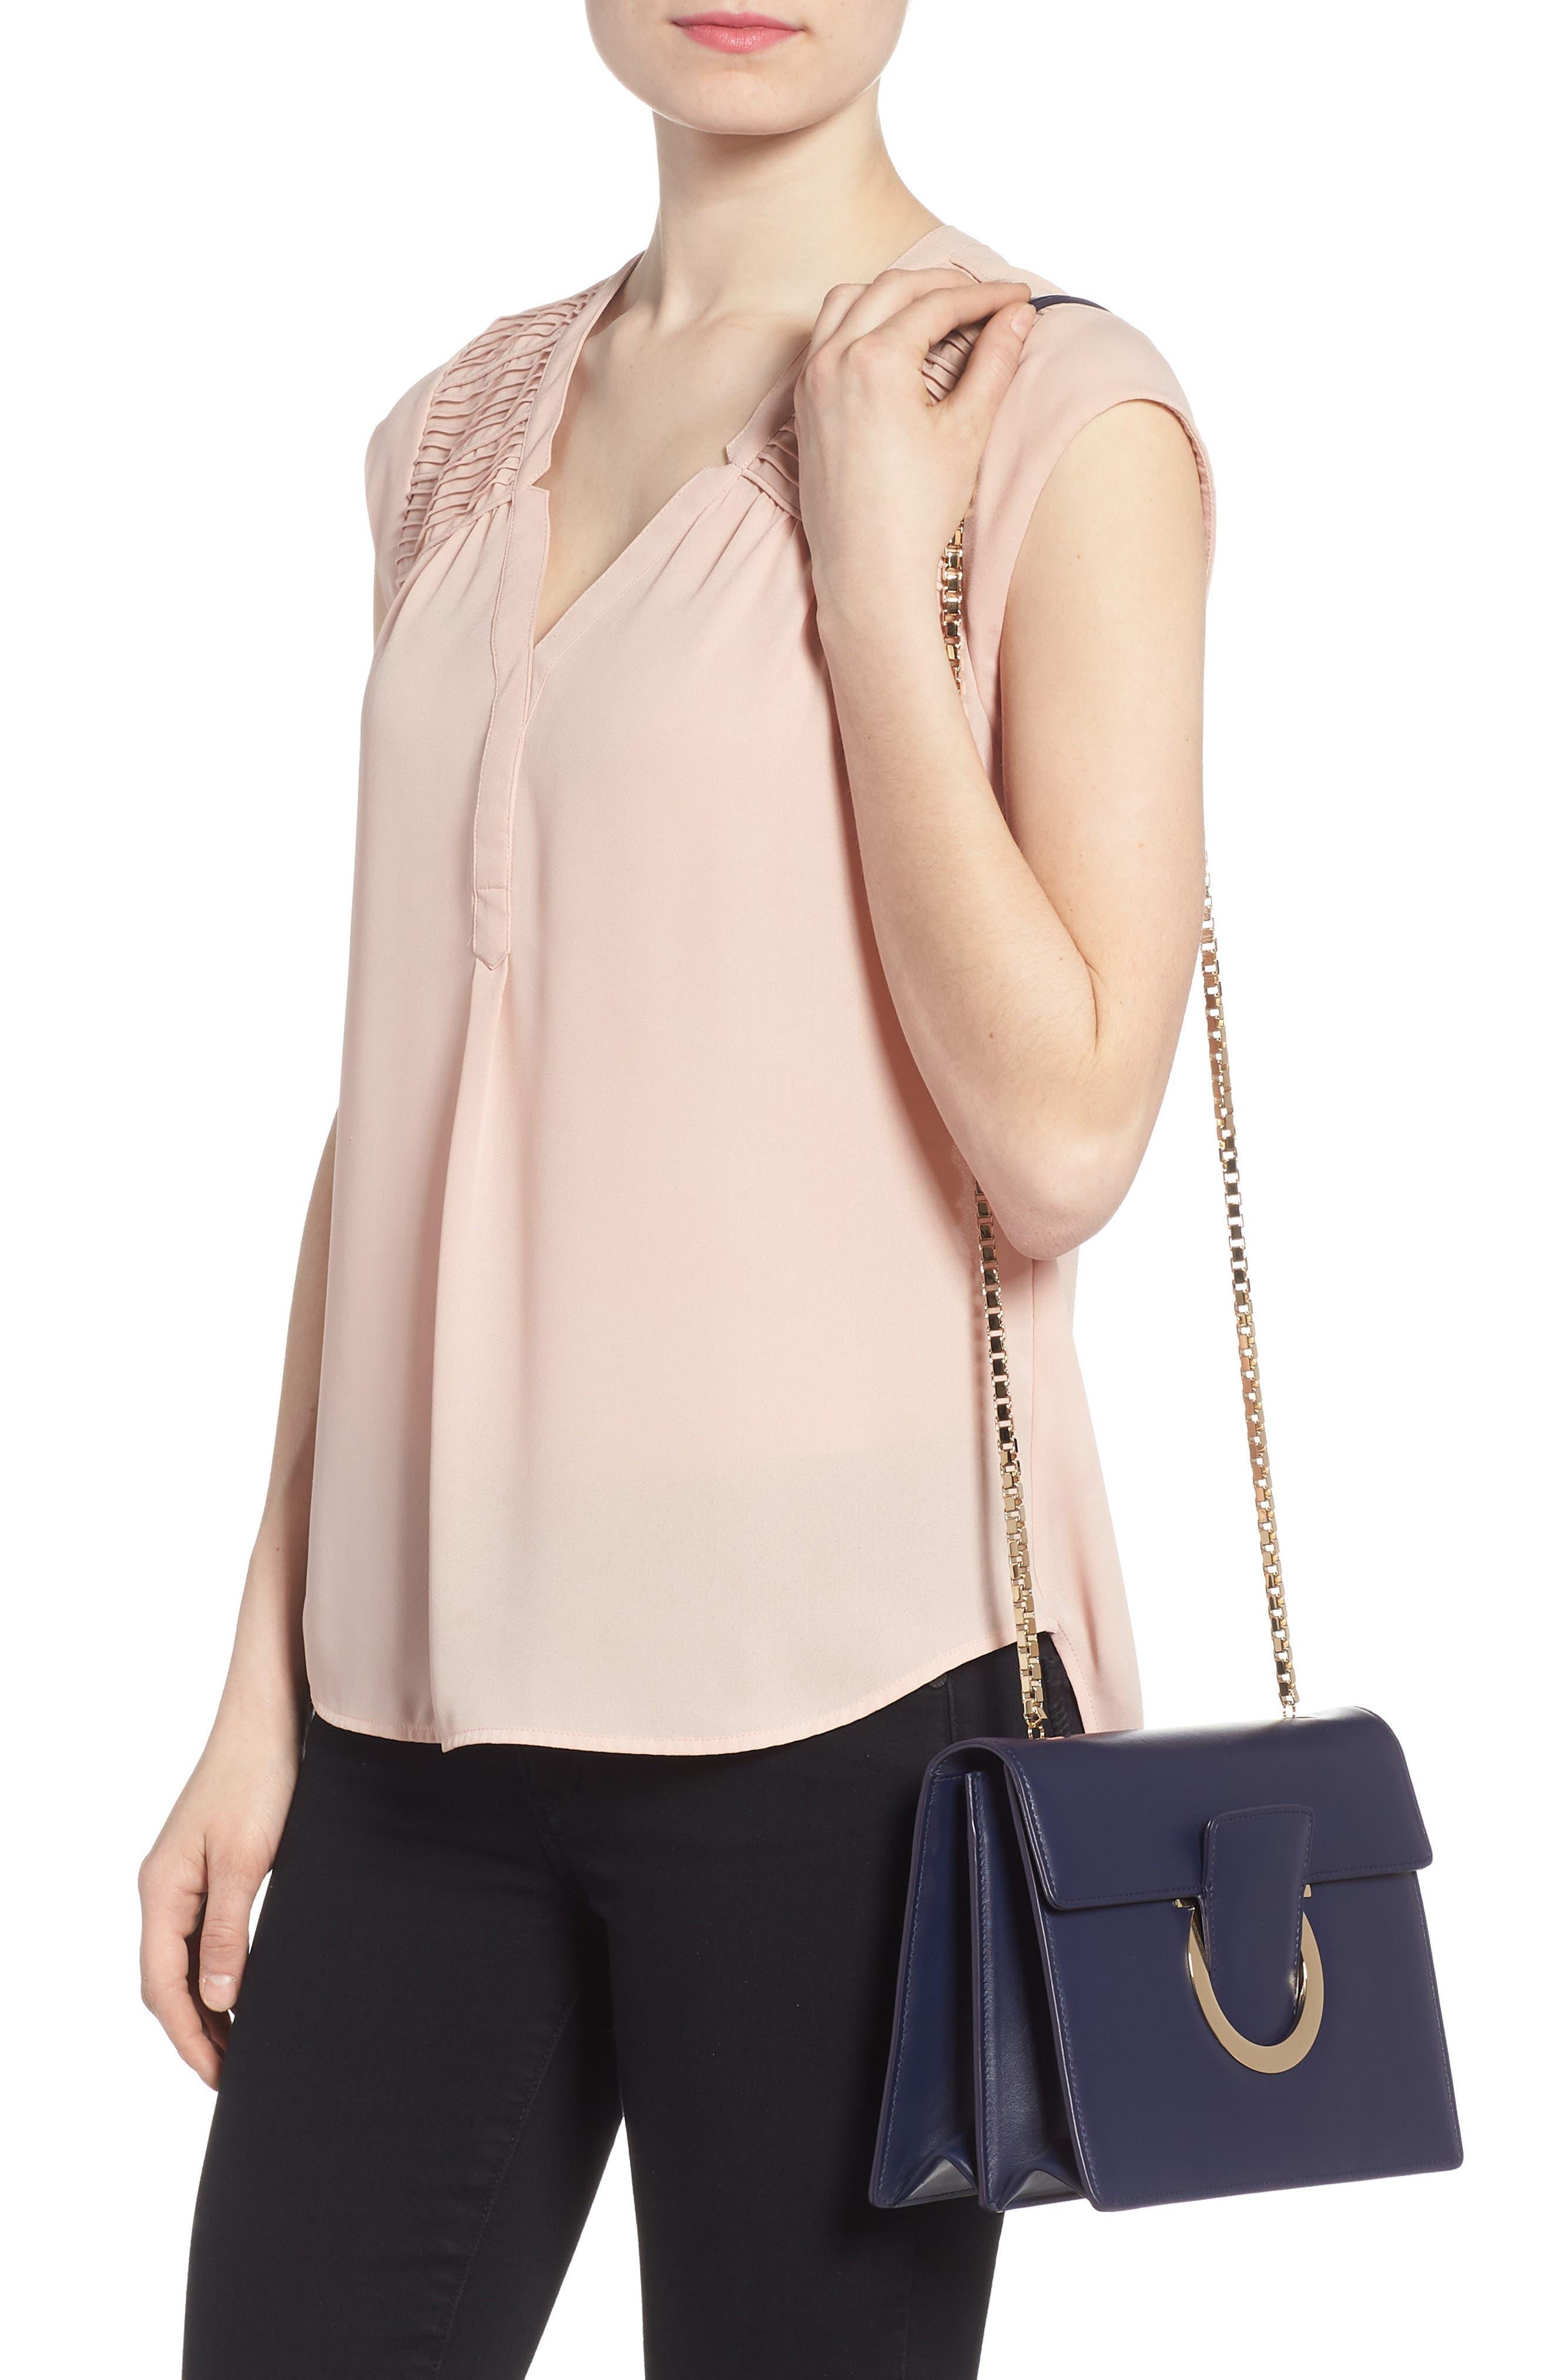 Thalia Gancio Leather Shoulder Bag by Salvatore Ferragamo